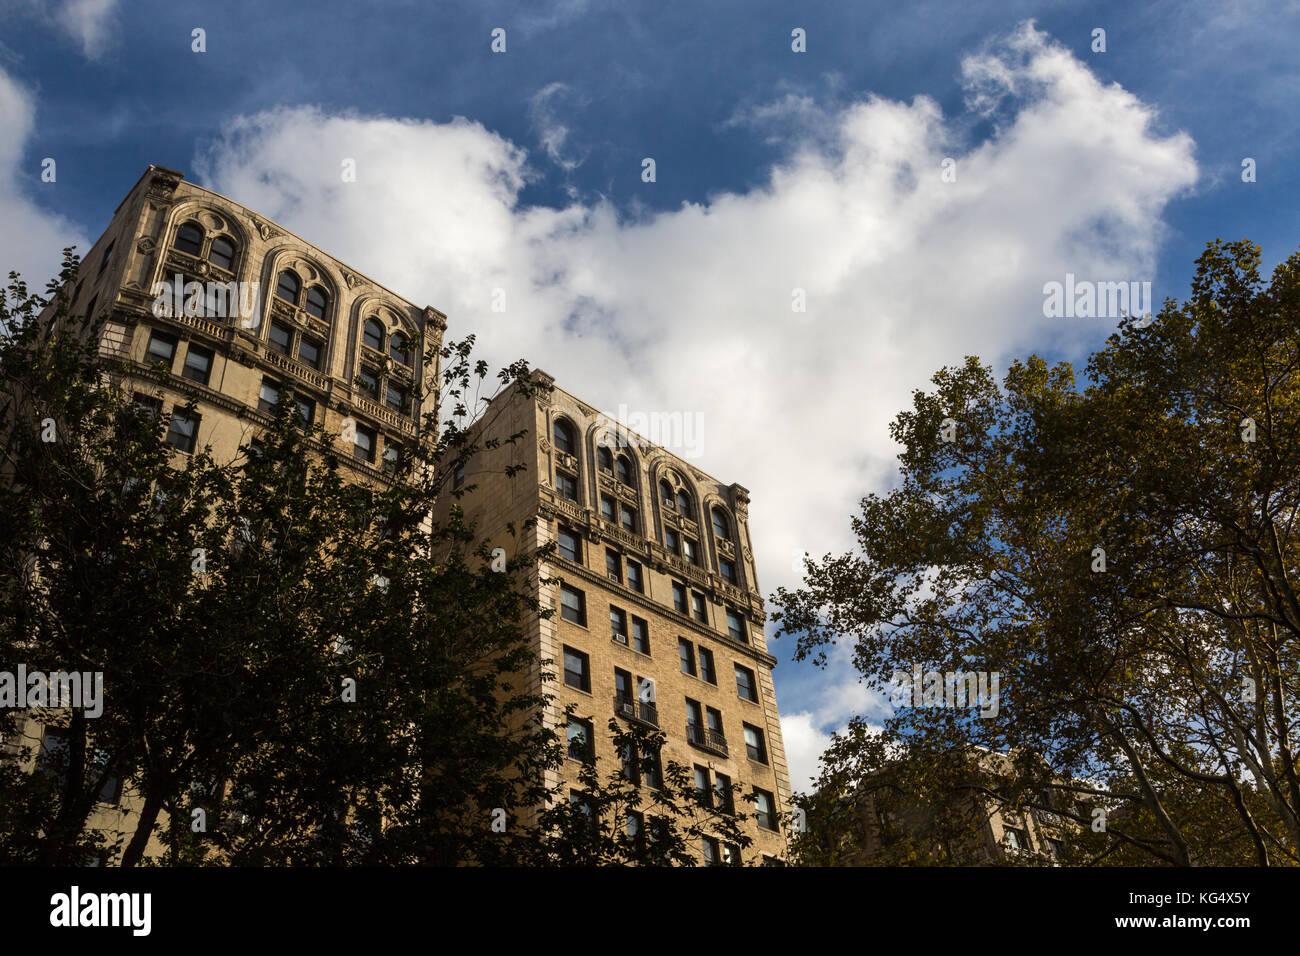 Apartment Gebäude am Riverside Drive und 157 Street in New York City. Stockbild